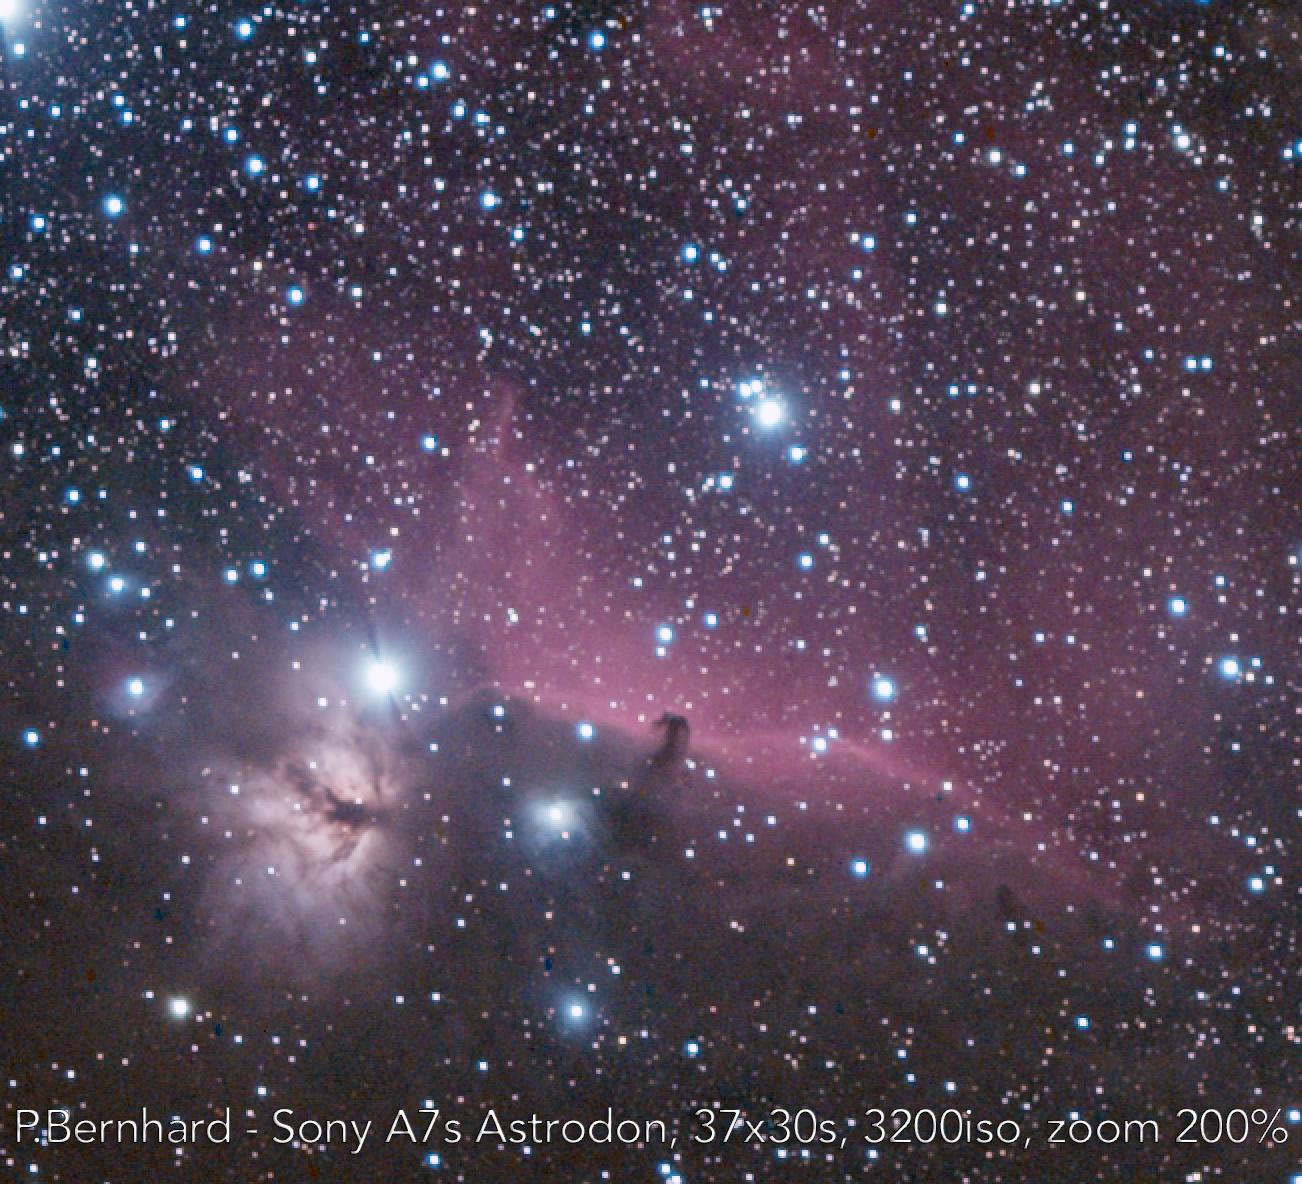 IC434_A7s_37x30s.jpg.86b262bd3ea7d8e36605ff002fa173cb.jpg